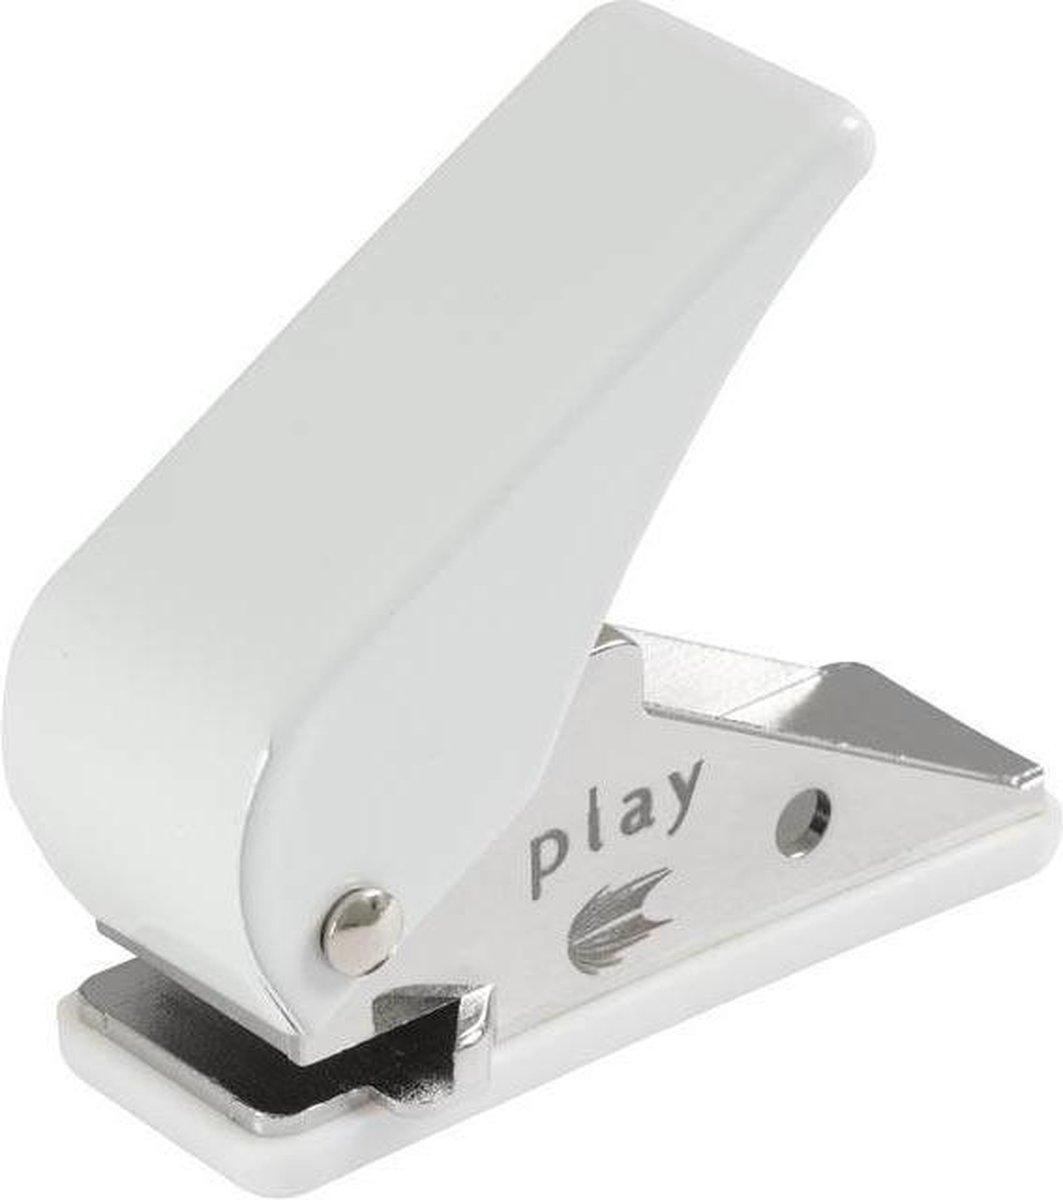 Target Play Flight Punch Machine